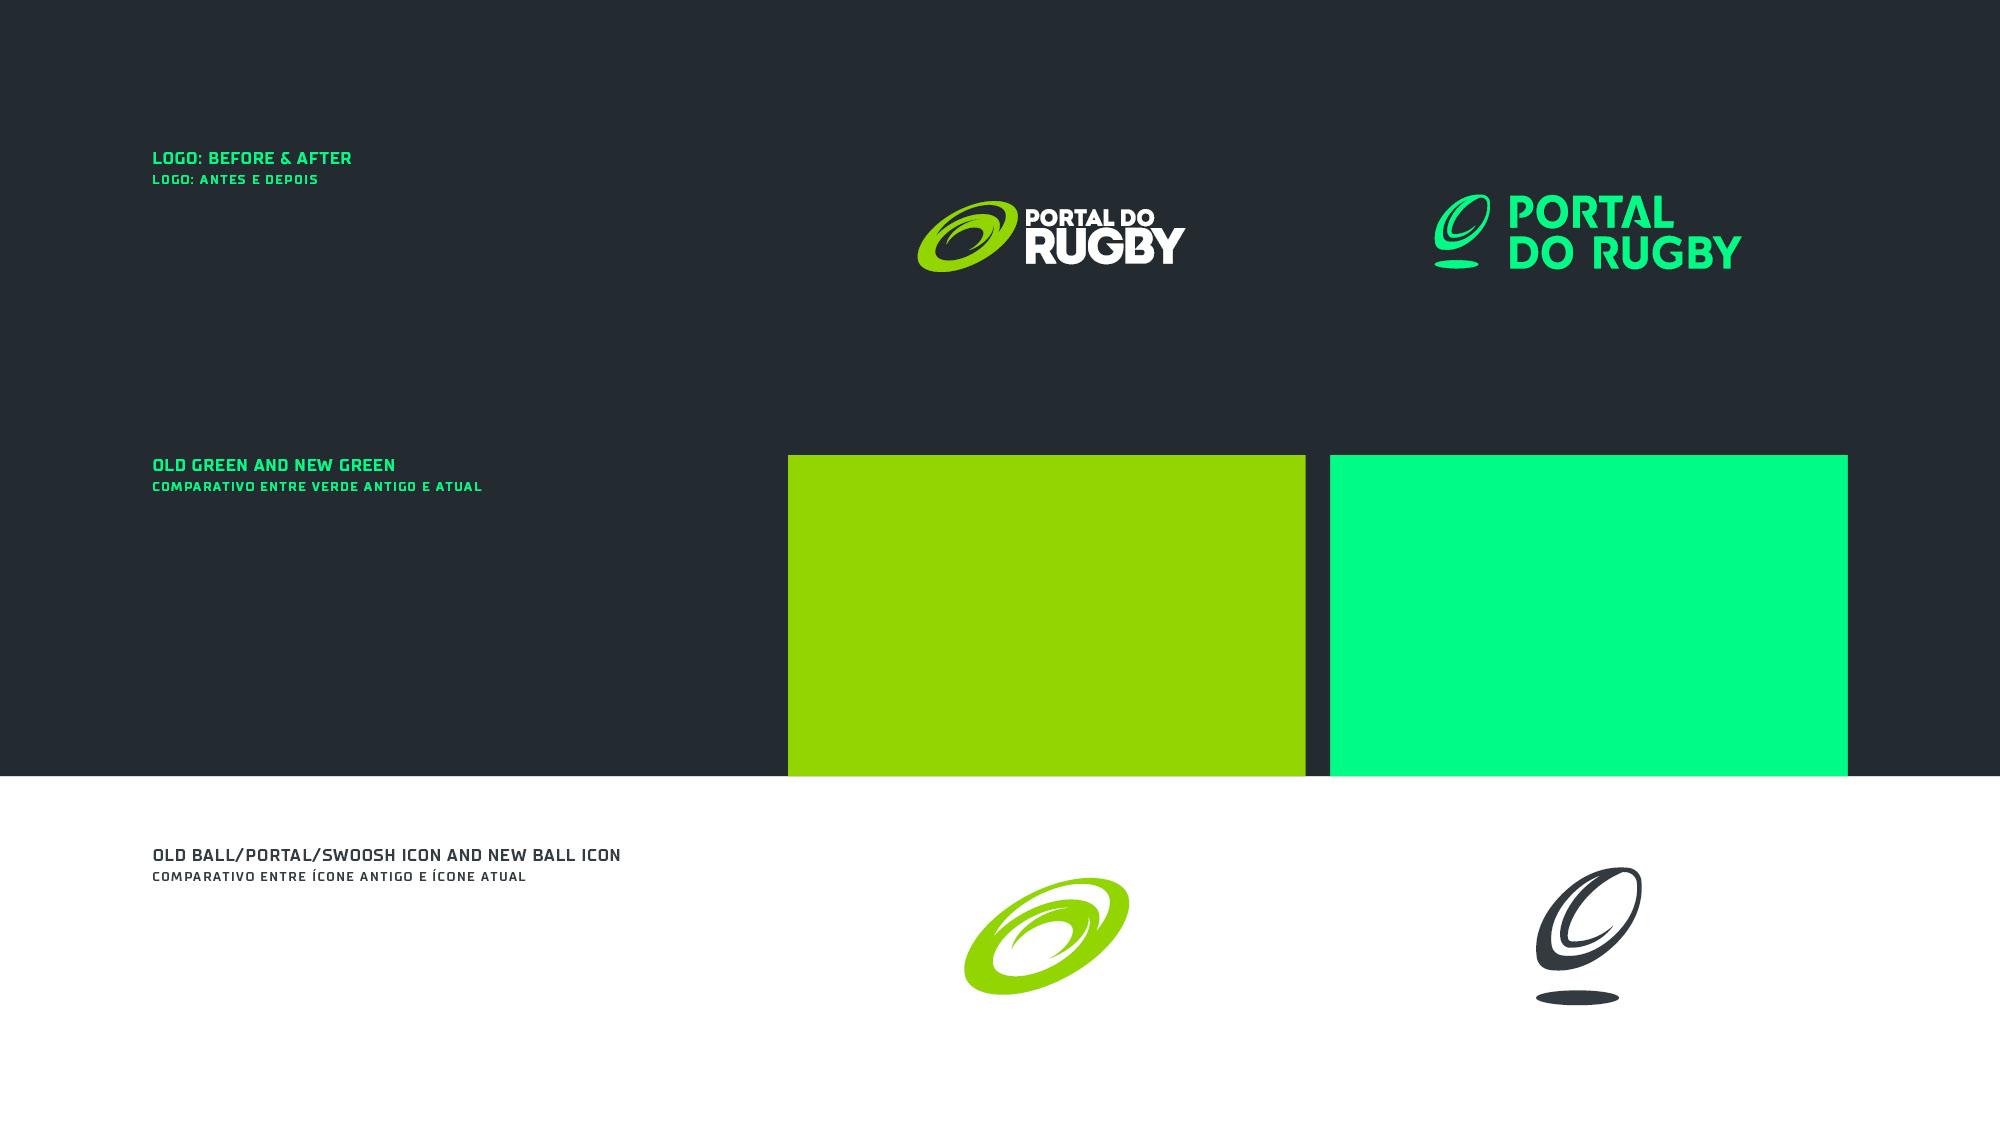 Nacione Branding - Portal do Rugby2